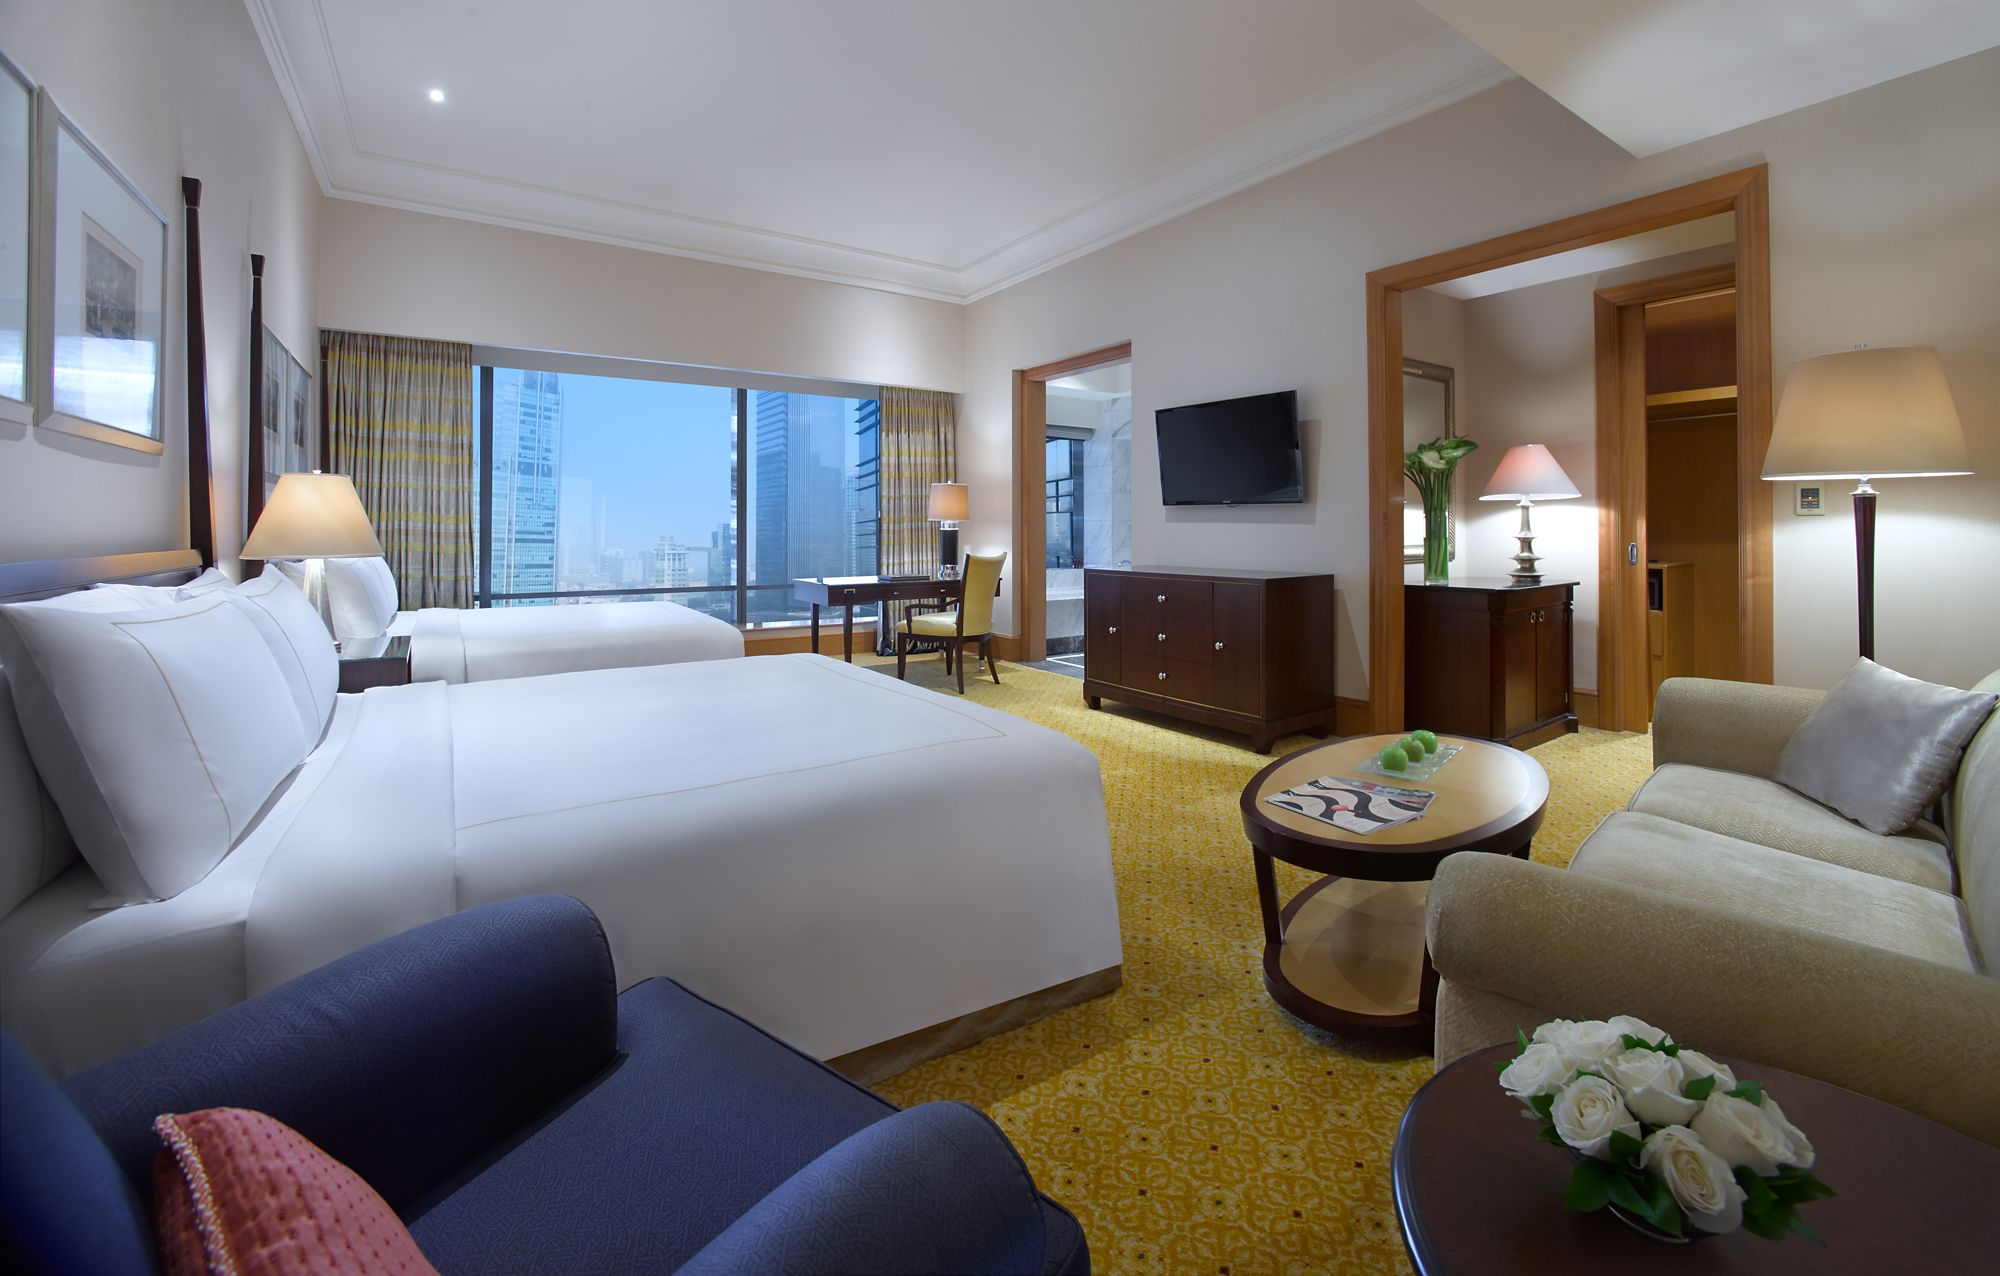 Harga Promo Menginap Di Hotel Bintang 5 Jakarta Points Geek